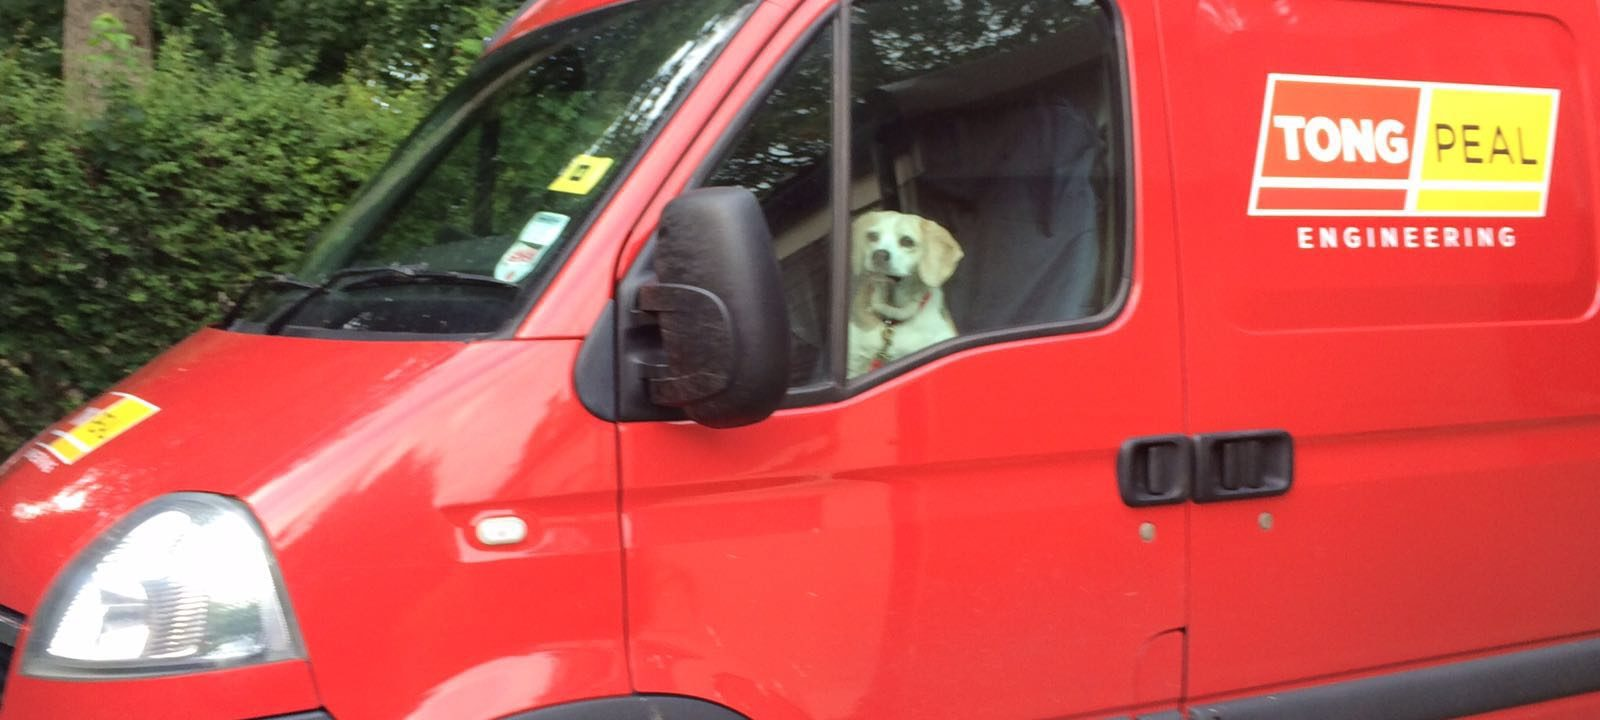 Snoopy Tong Office Dog Beagle (2)